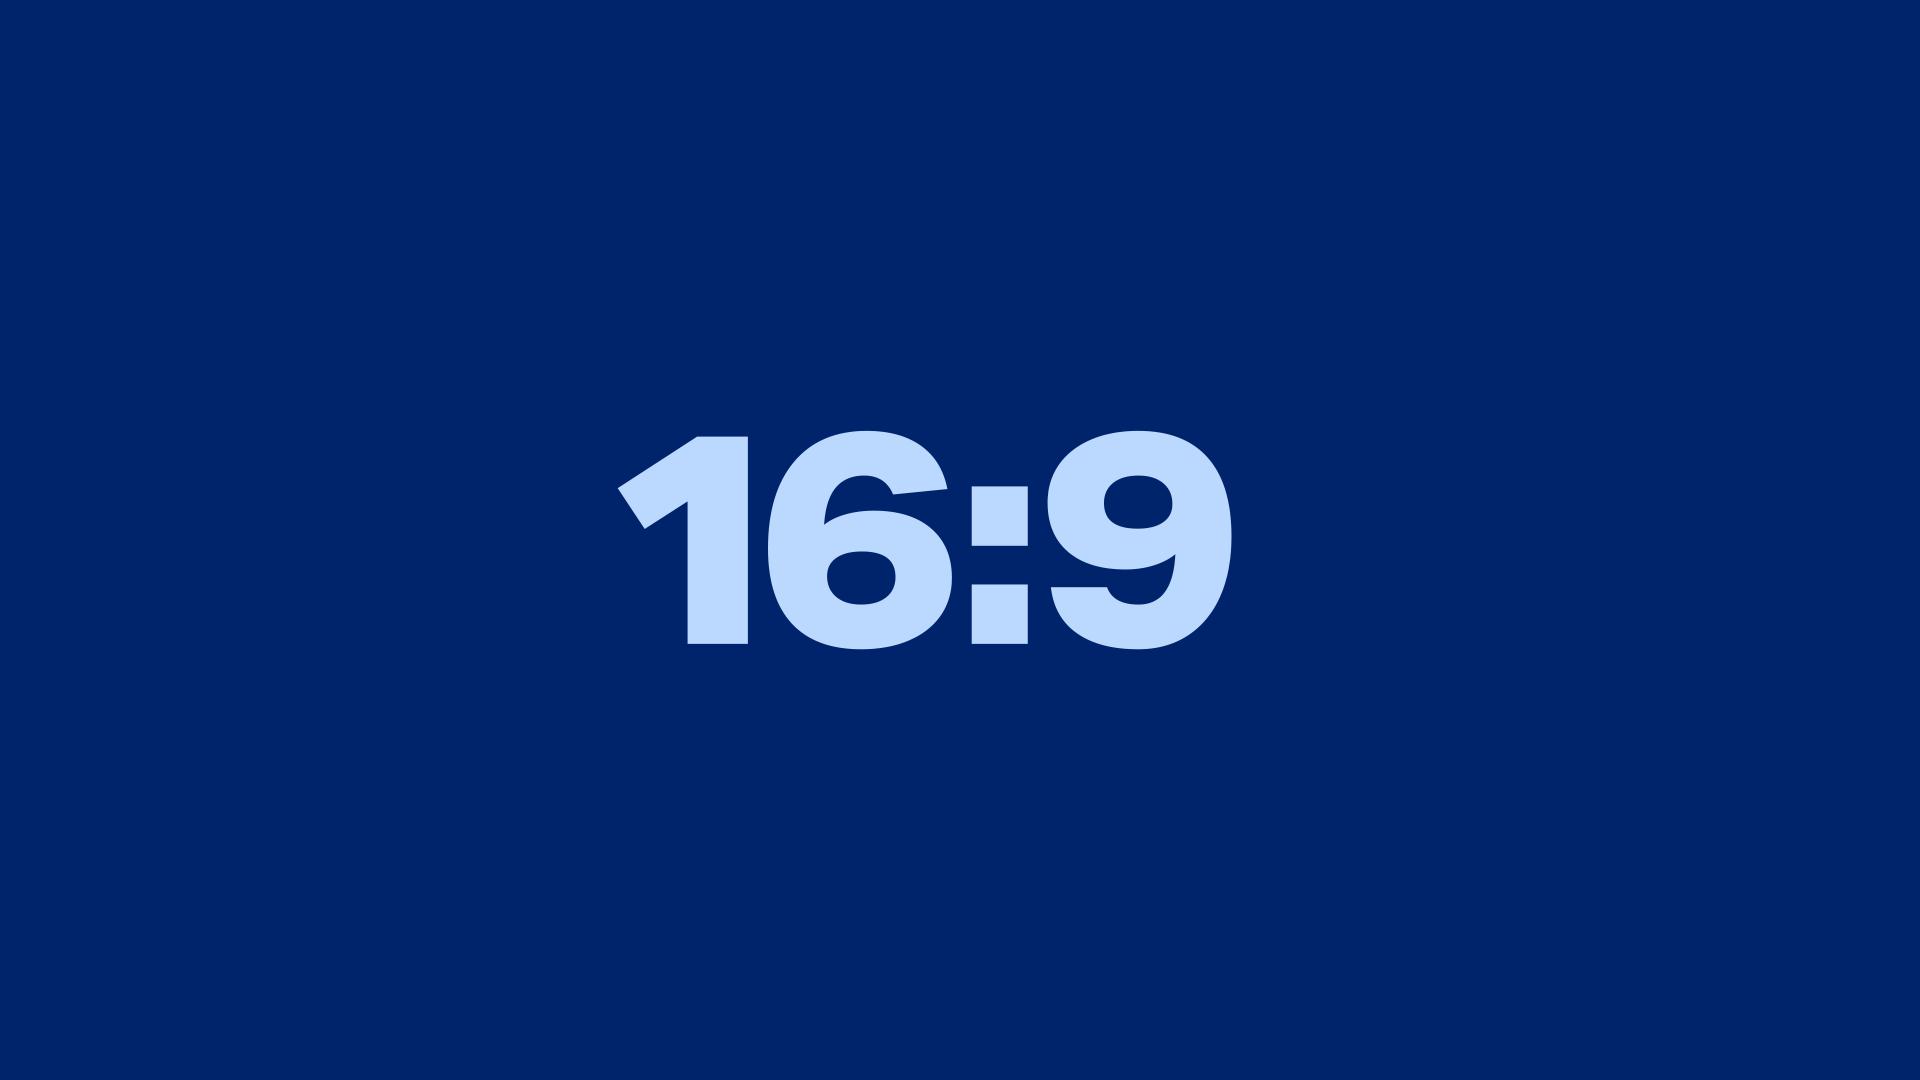 aspect-ratios-blogpost-16x9-1 (1).